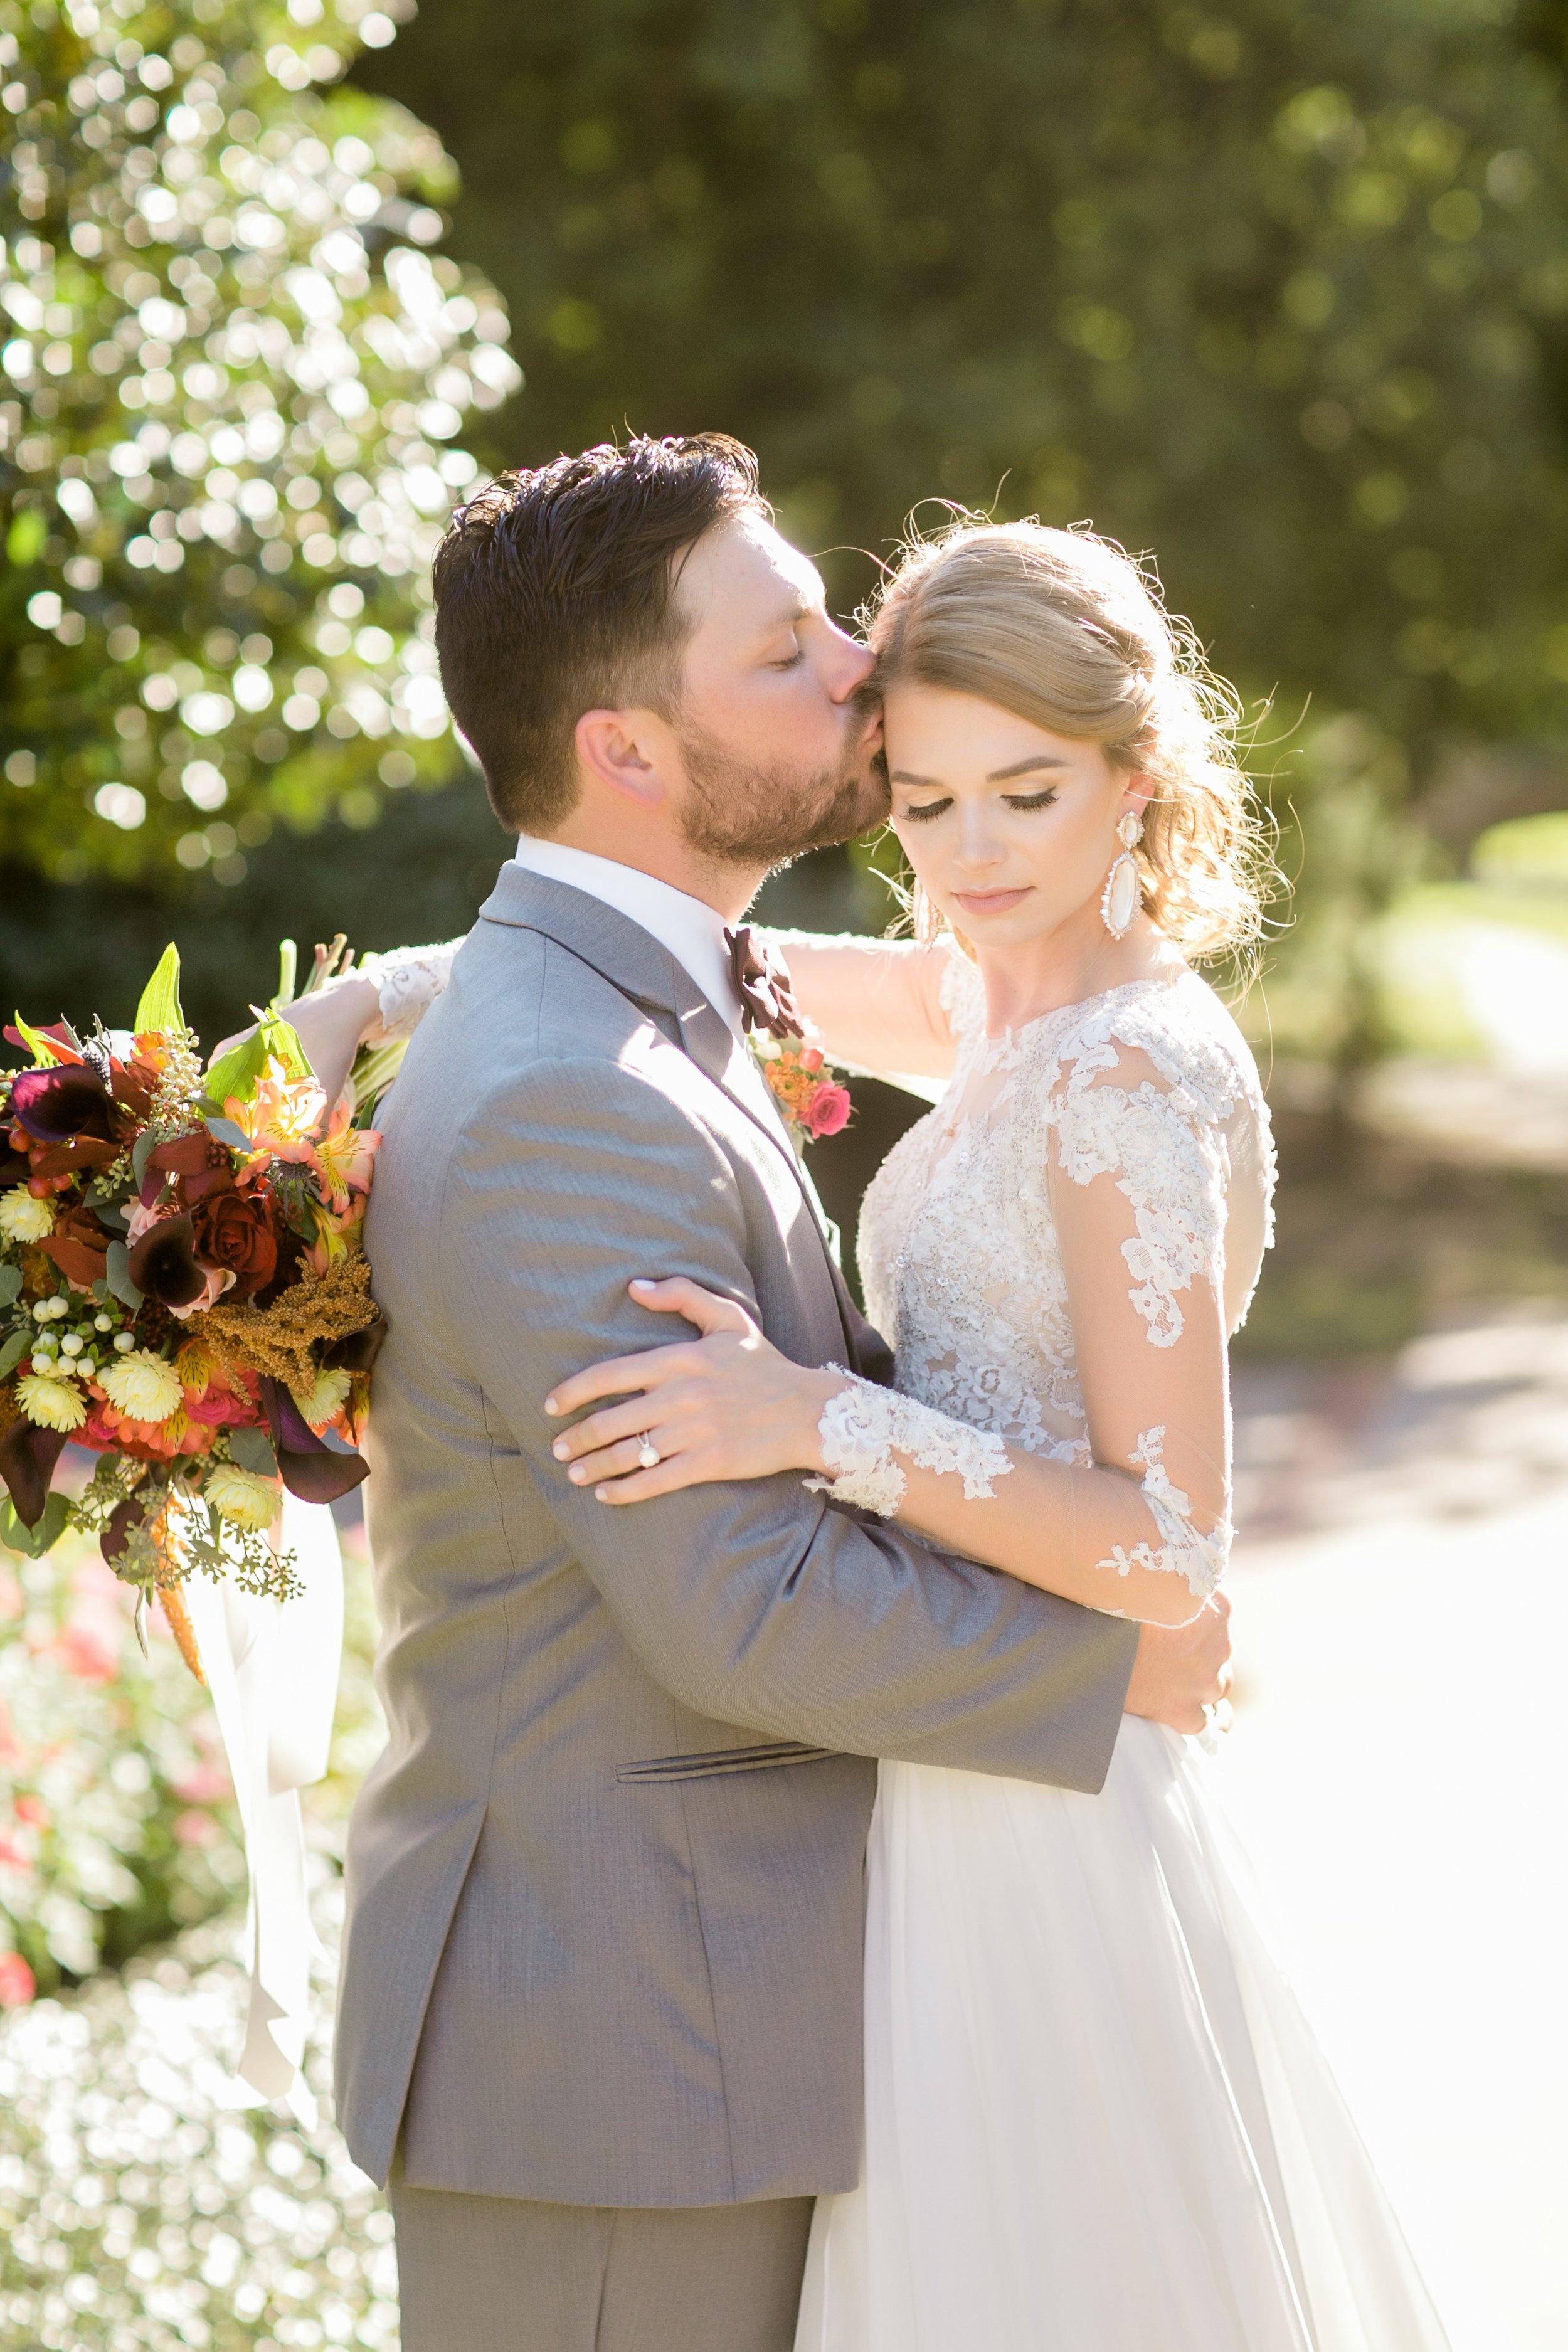 Roberson-Wedding-The-Forum-Lauren-Pinson-Wedding-Photography-Wichita-Falls-Texas-040.jpg